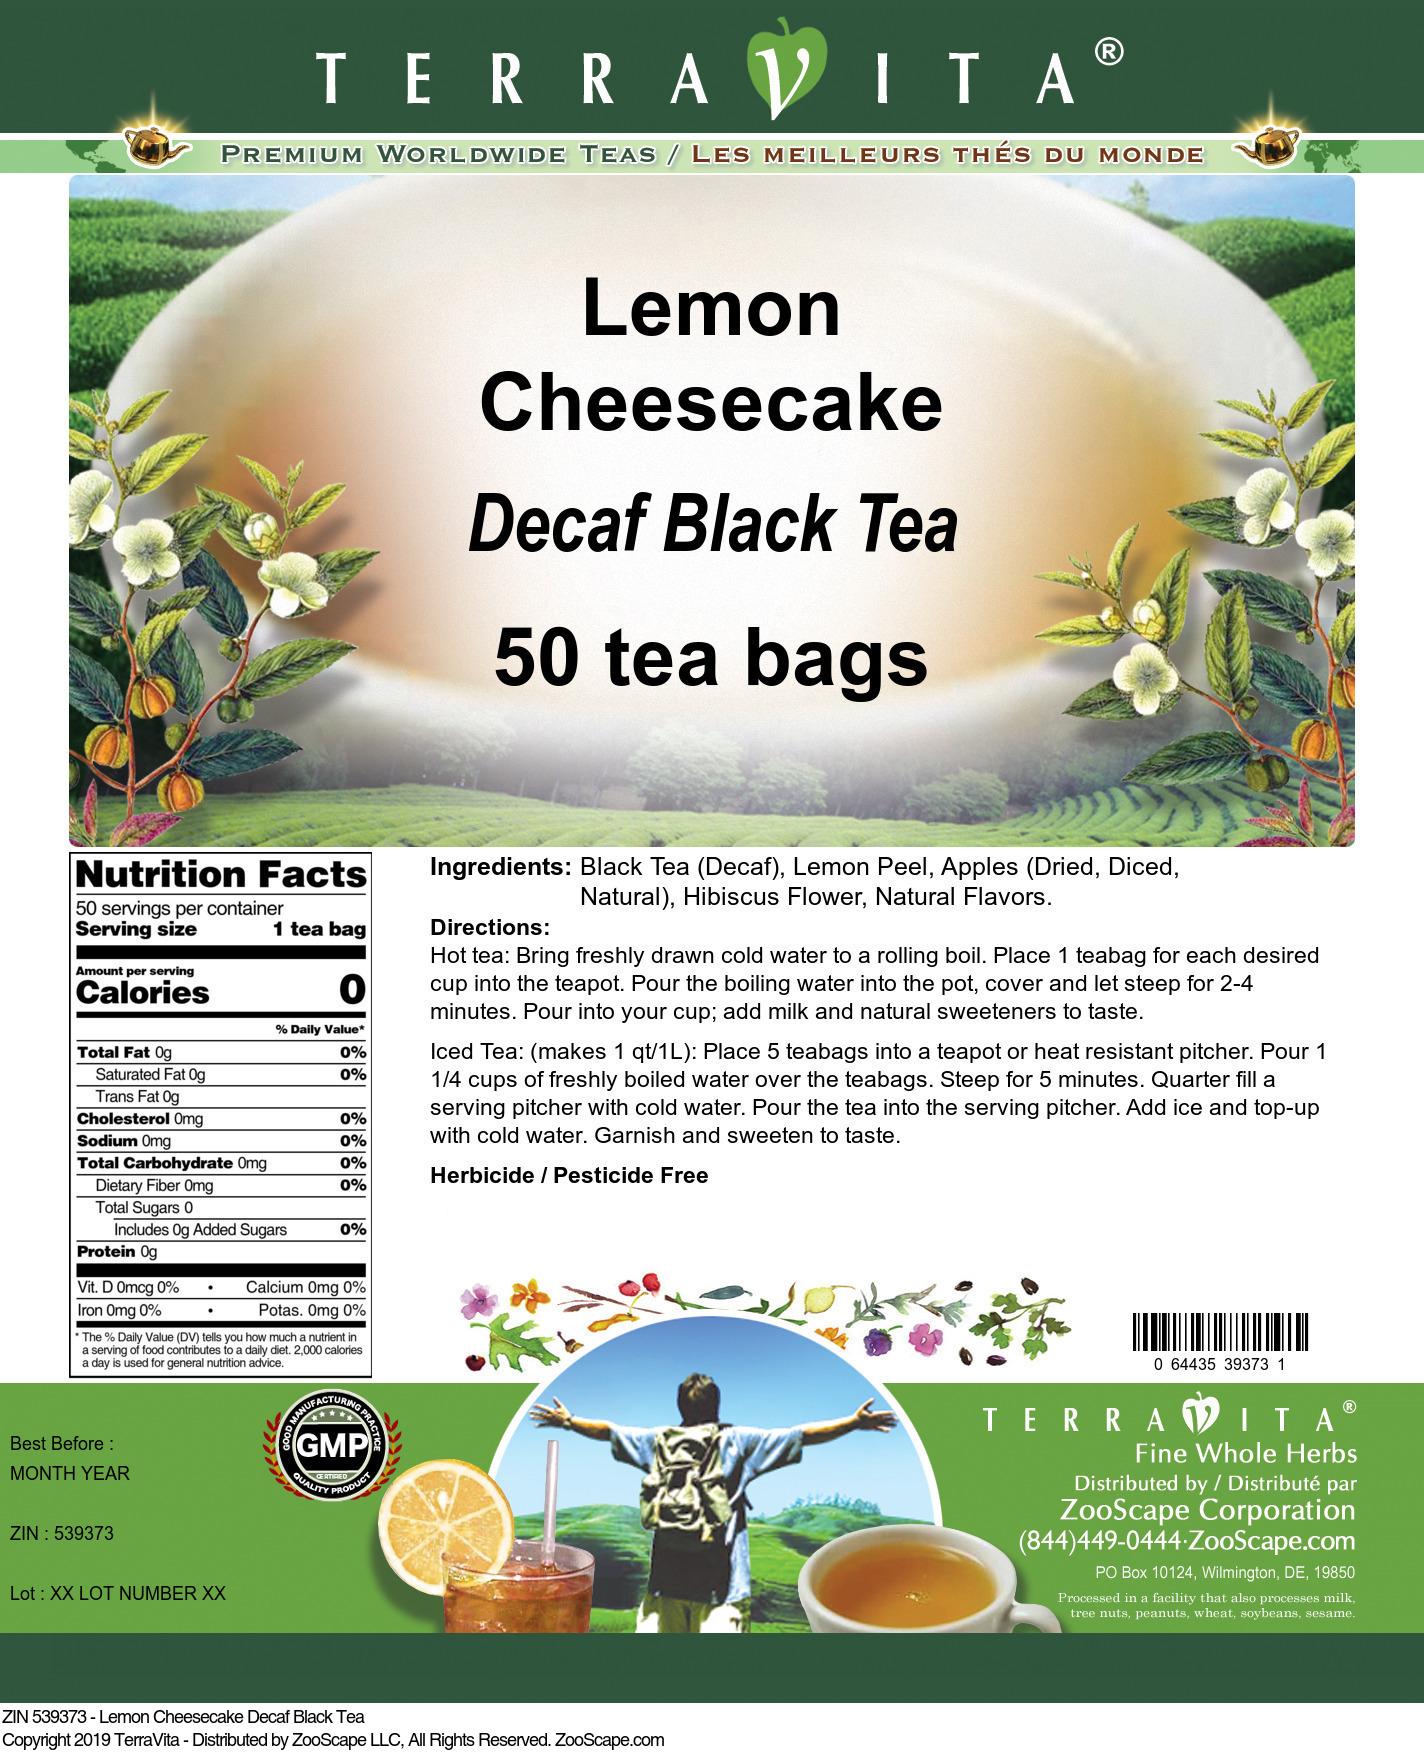 Lemon Cheesecake Decaf Black Tea